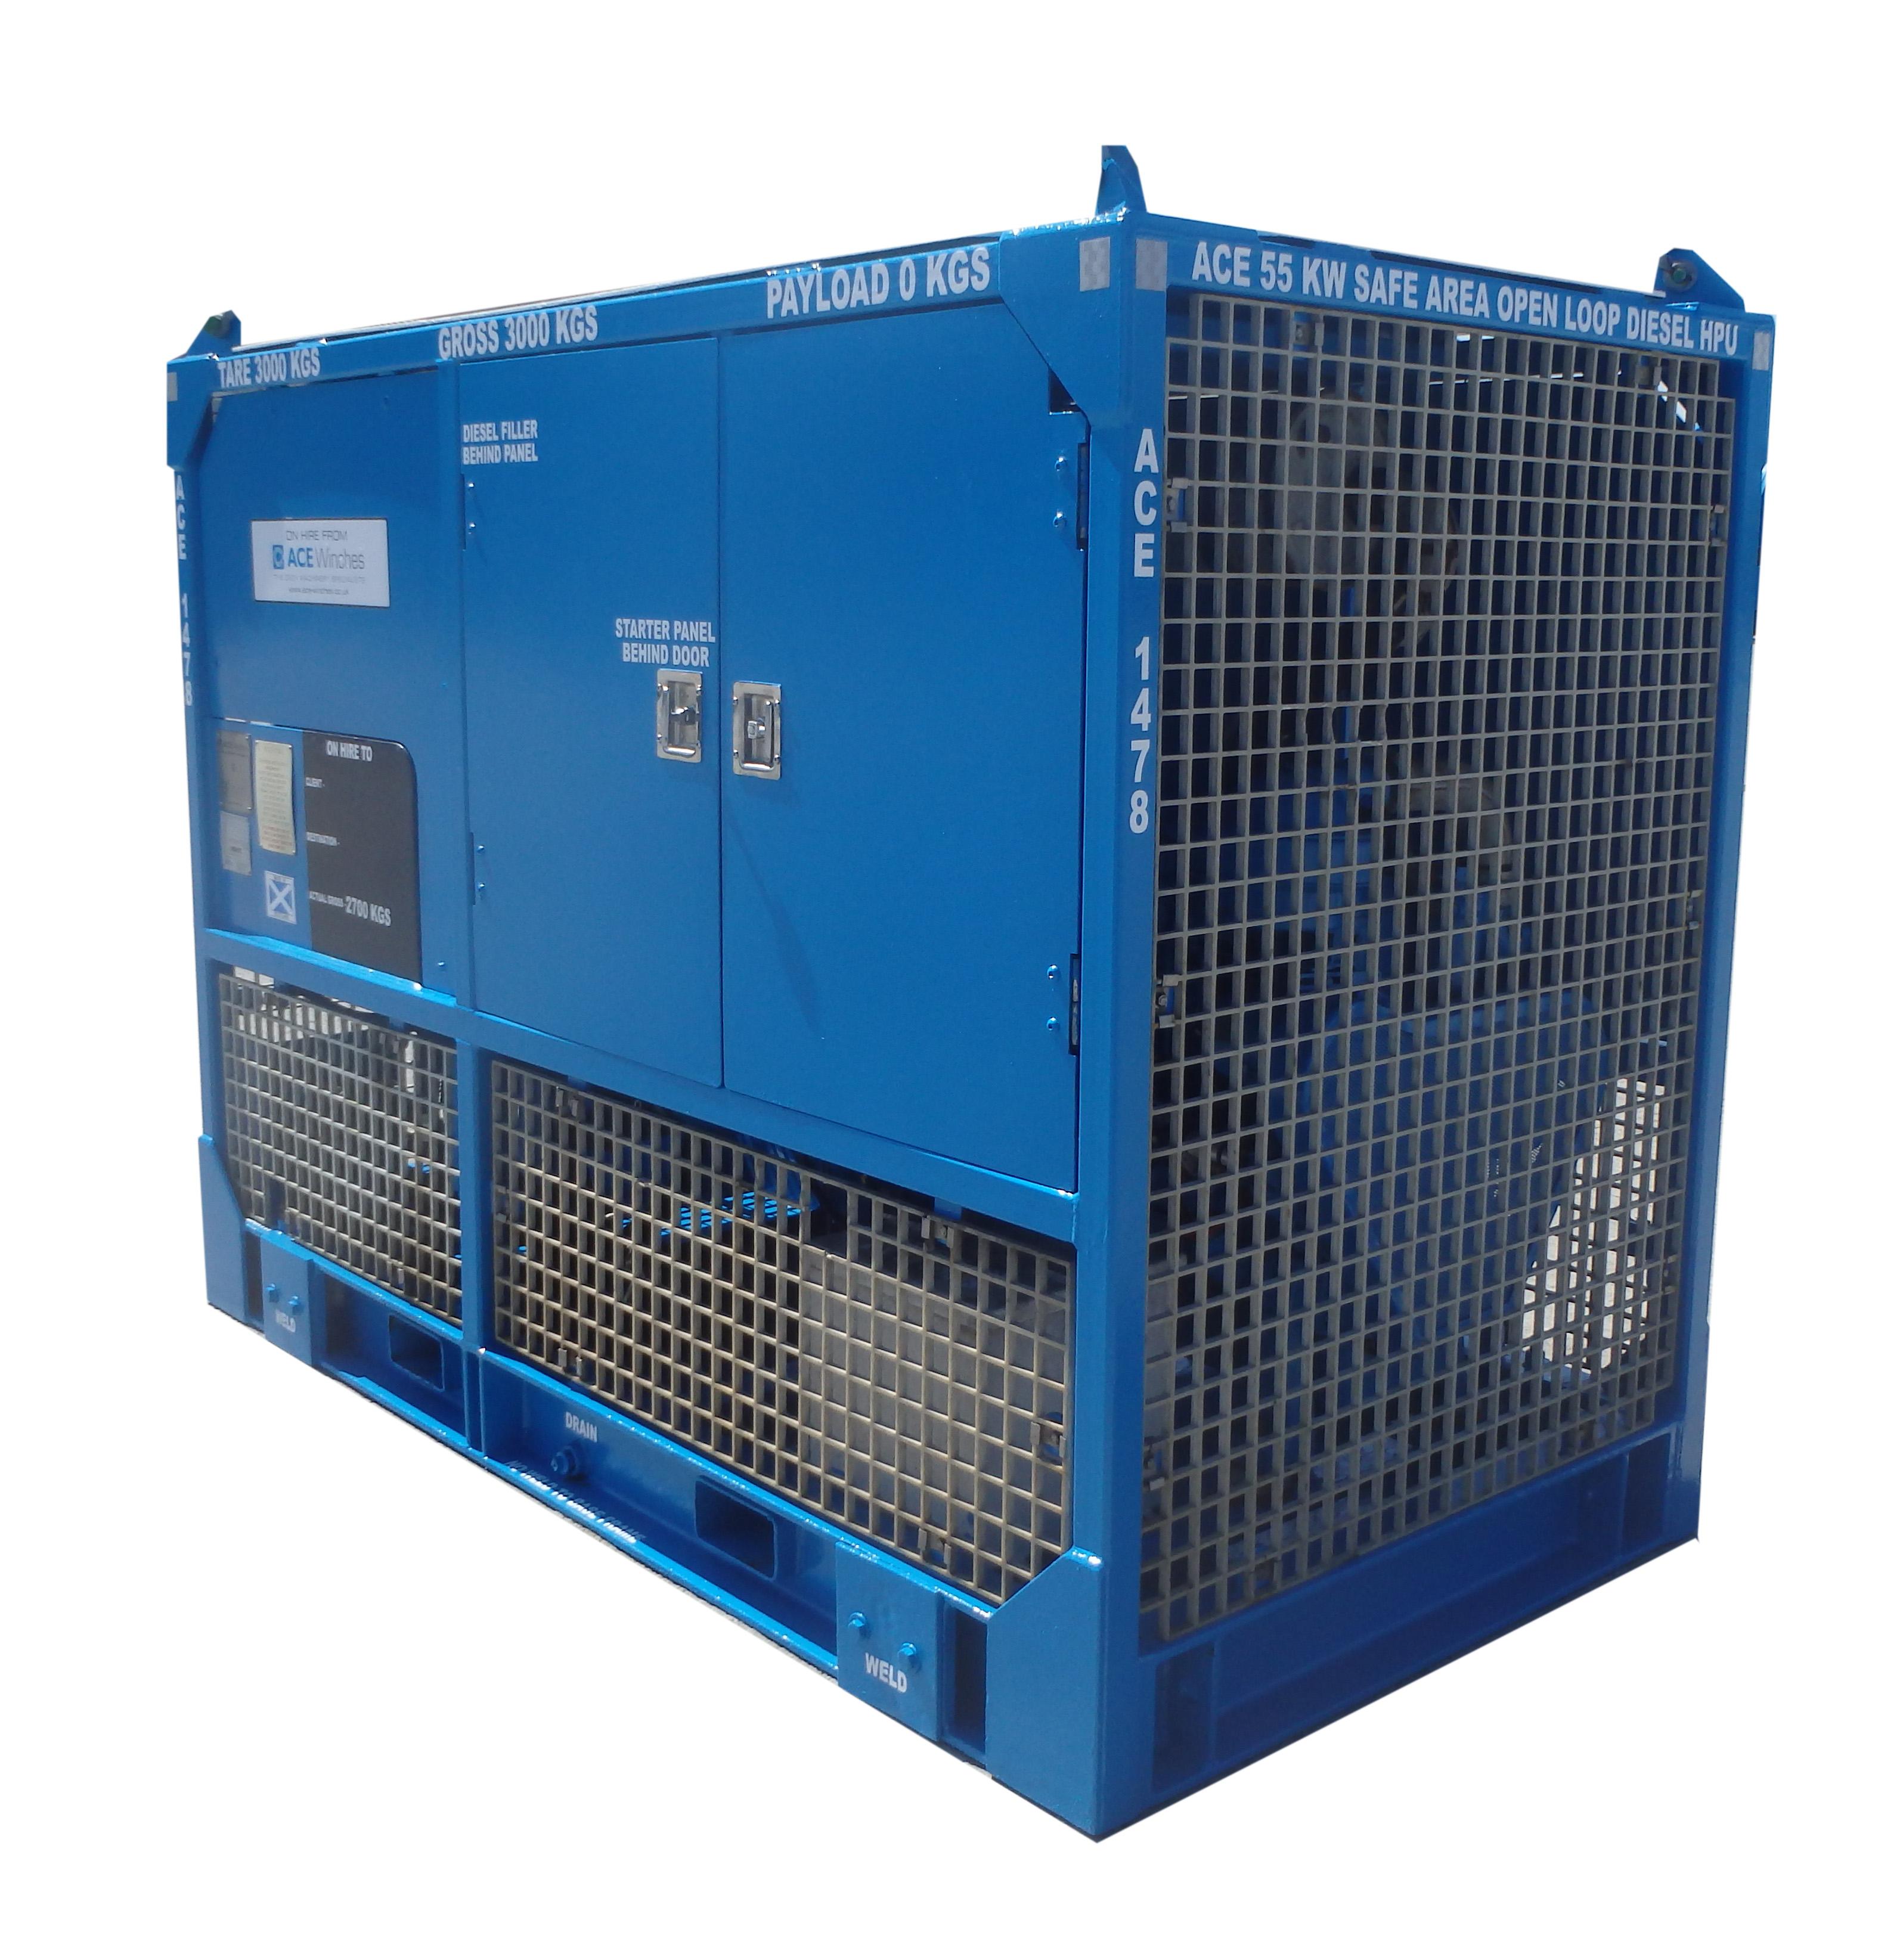 ACE 55kW Safe Area Open Loop diesel HPU